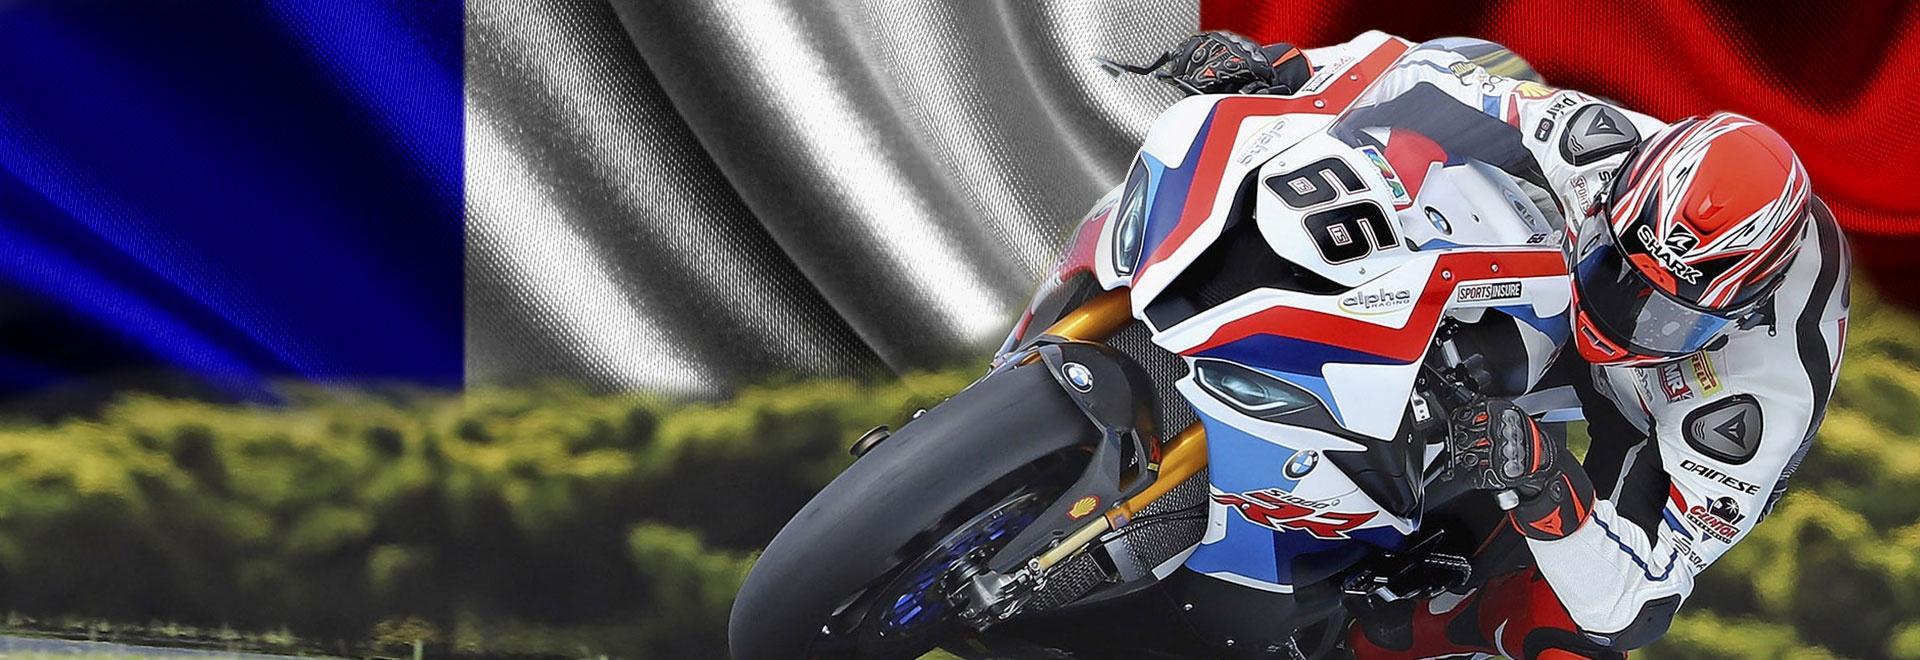 Francia. Race 1